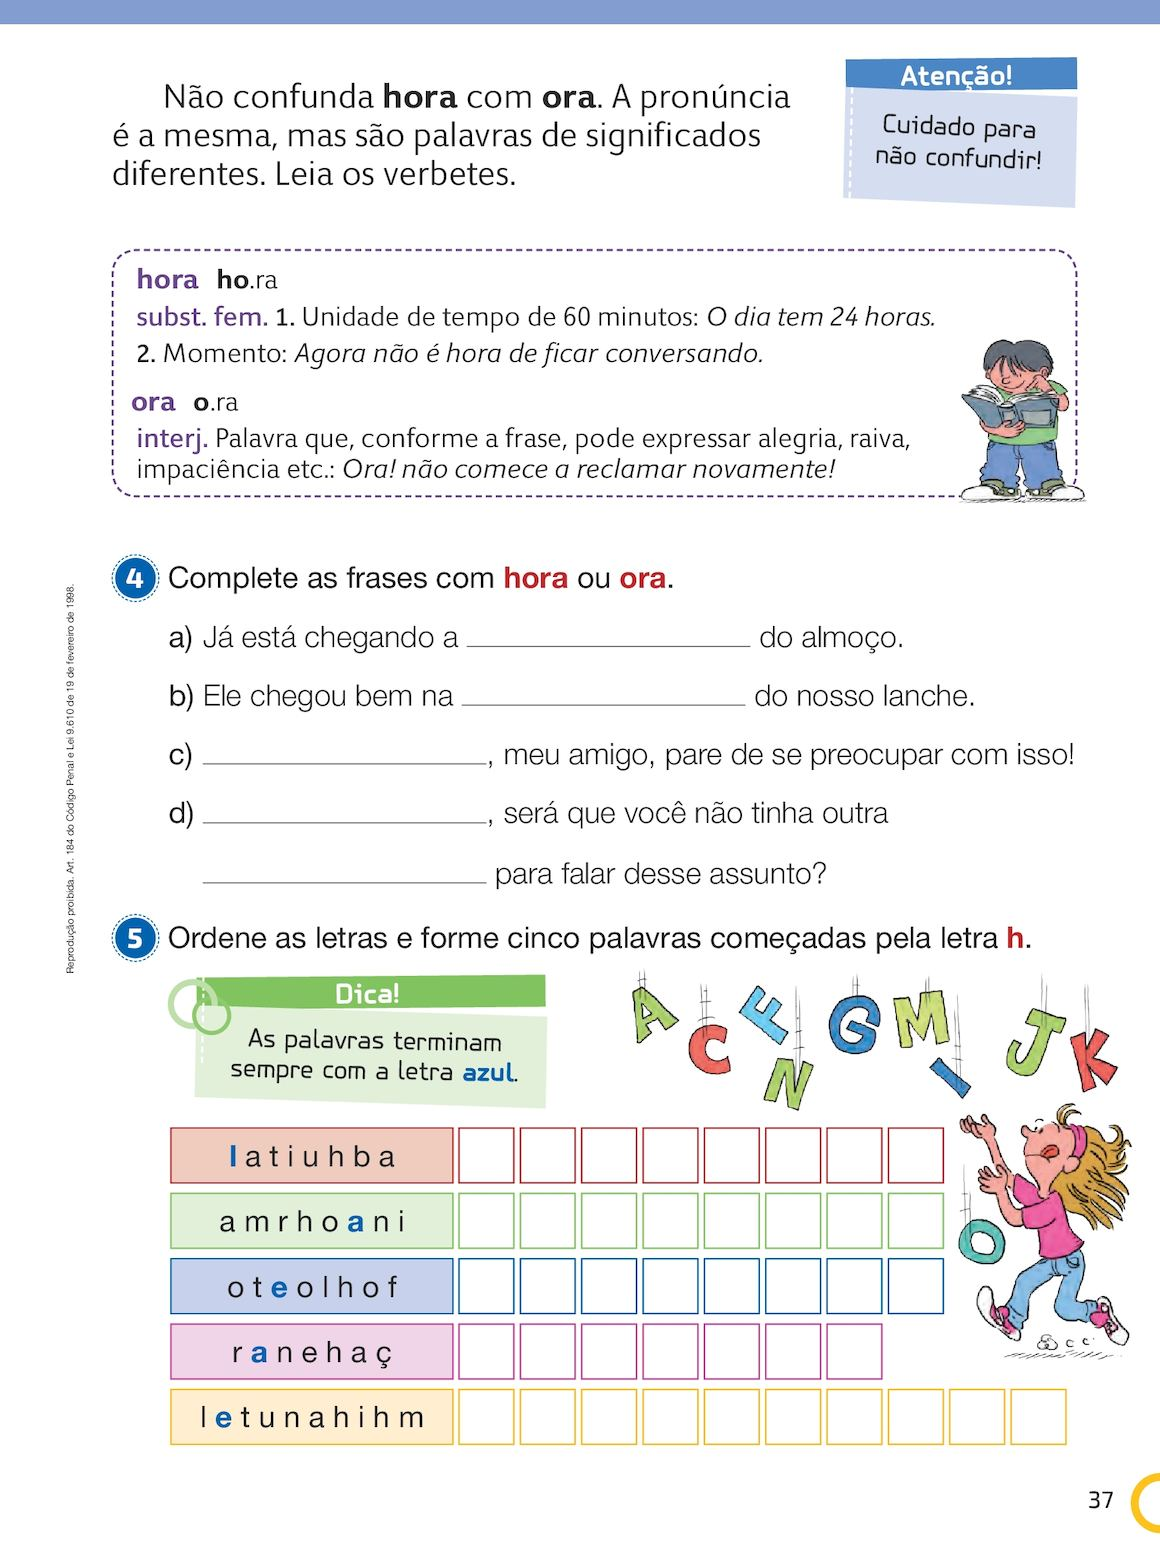 Gramatica Fundamental 5 Ano Calameo Downloader